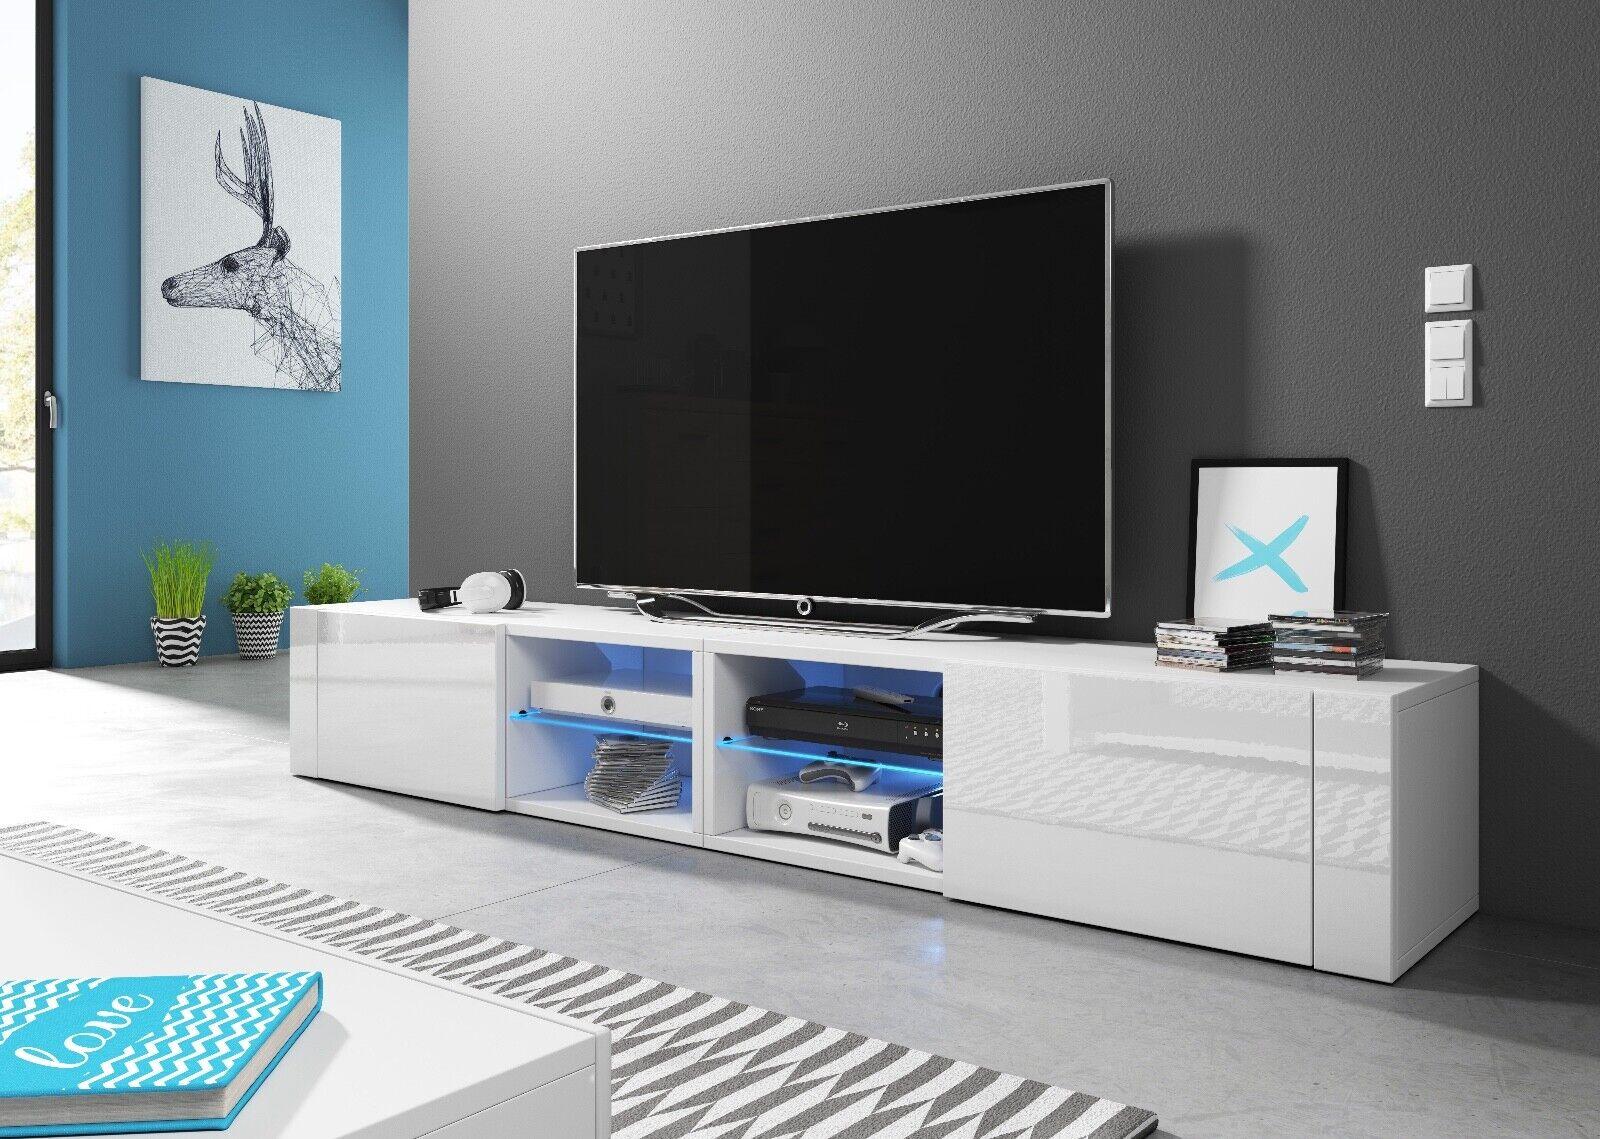 Hit2 Double 200 Cm Sideboard Lowboard Tv Fernsehschrank Inkl Led Highboard Yatego Com